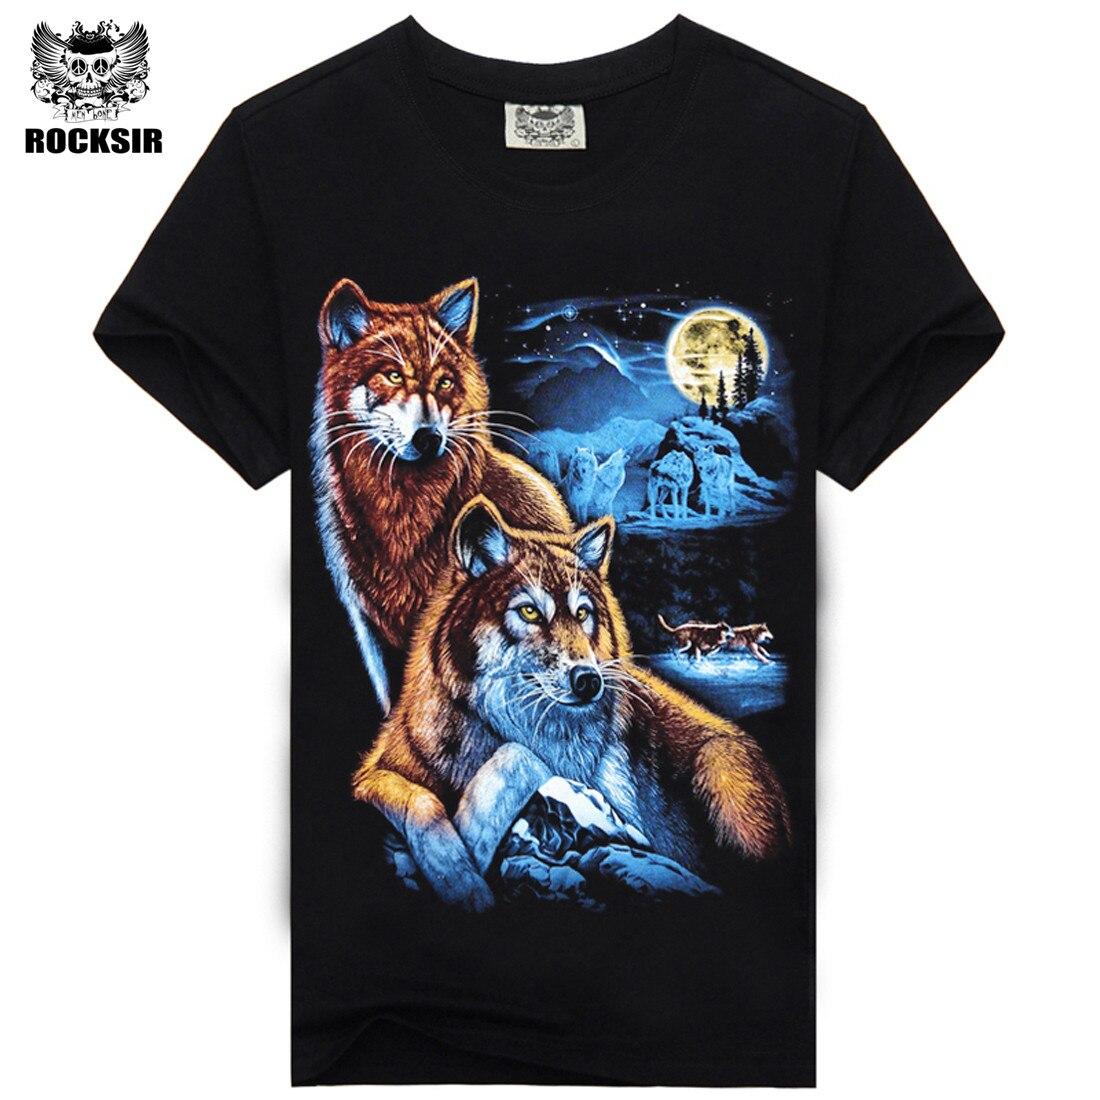 HTB1FwqUSpXXXXXhaXXXq6xXFXXXB - Rocksir 3d wolf t shirt Indians wolf t shirts boyfriend gift ideas